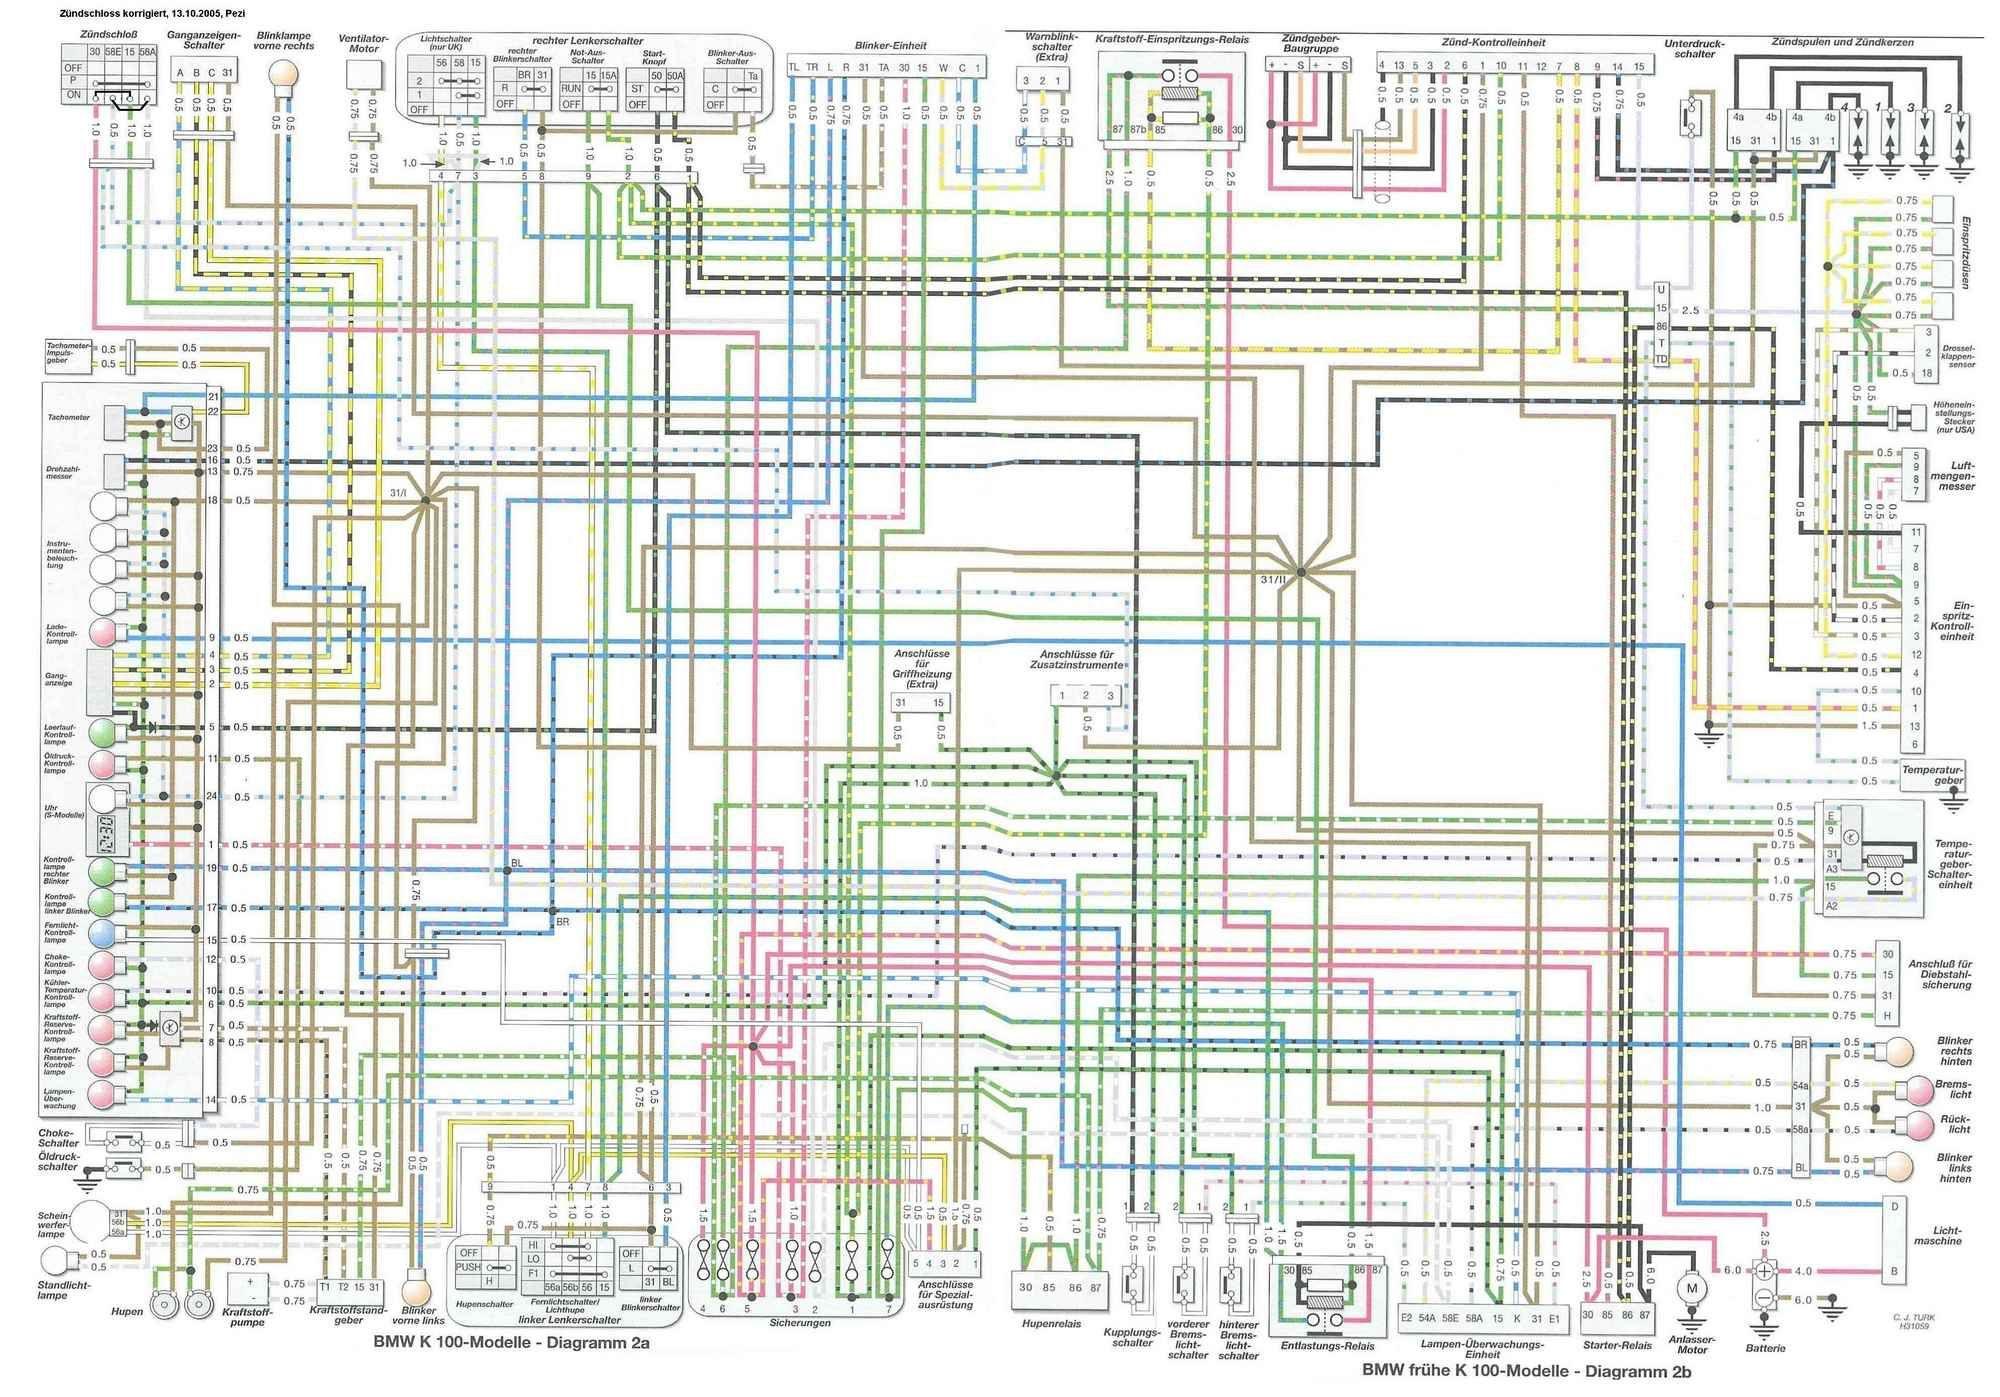 k100_early_wiring_diagram jpeg 1 161×937 пикс Надо попробовать honda wiring diagram k100_early_wiring_diagram jpeg 1 161×937 пикс Надо попробовать pinterest diagram and bmw